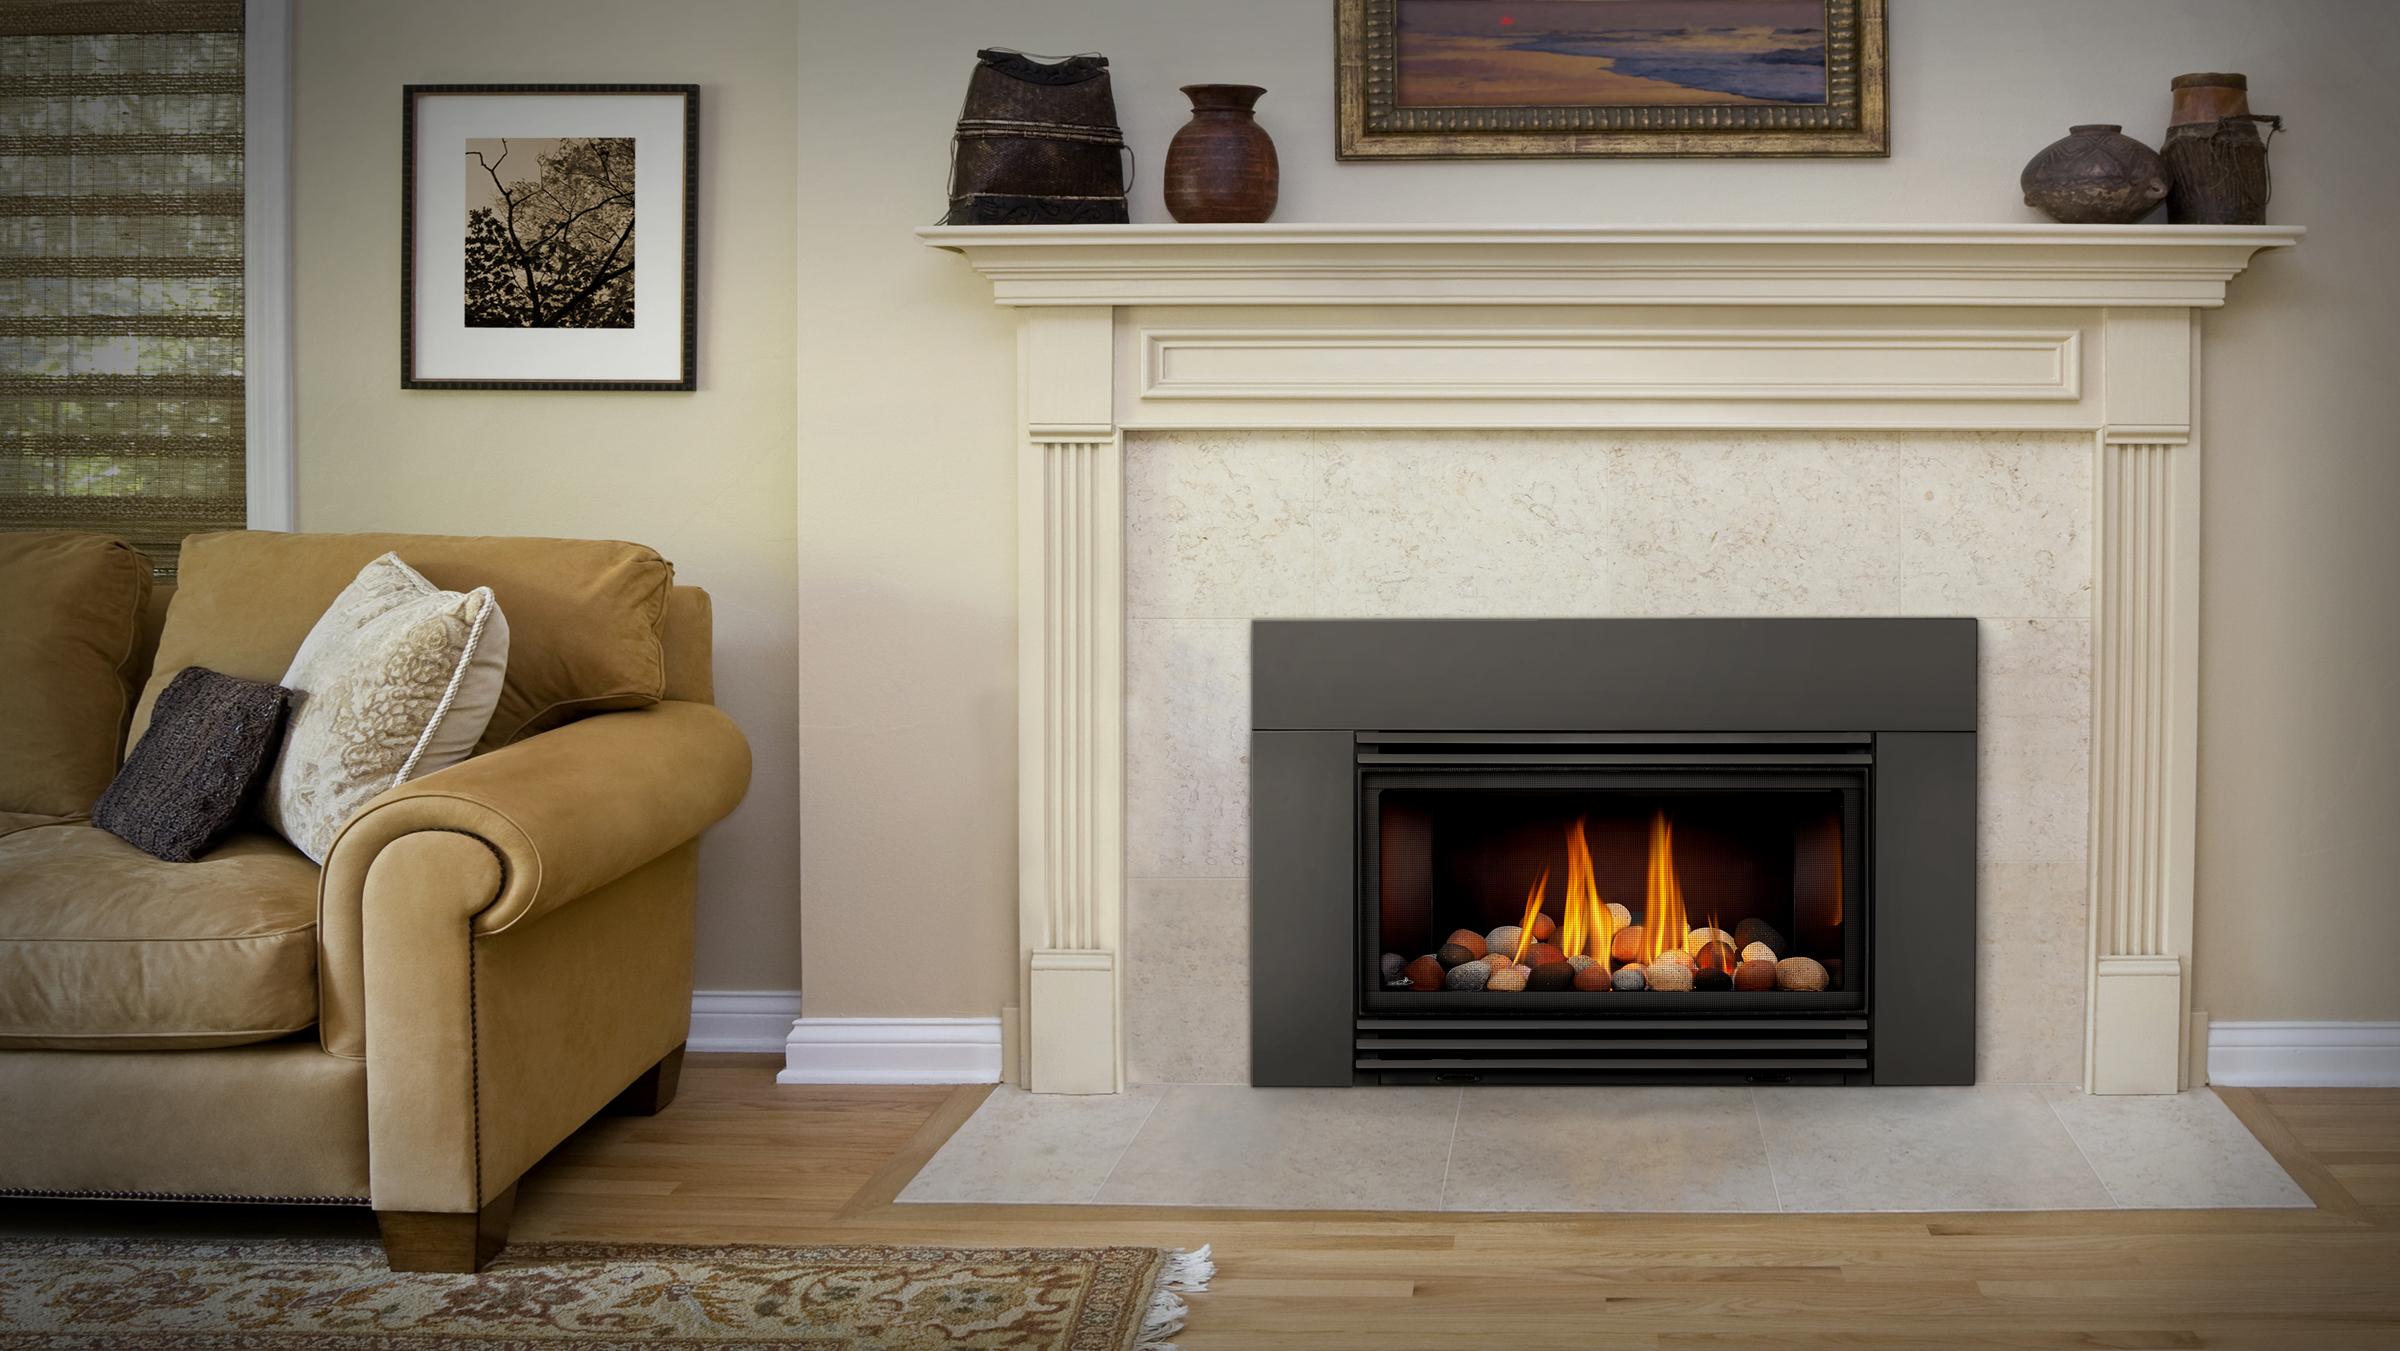 cdi30-livingroom-curved-SB-multirocks-blacklouvers-6_deluxeflashing-continental-fireplaces (1).jpg